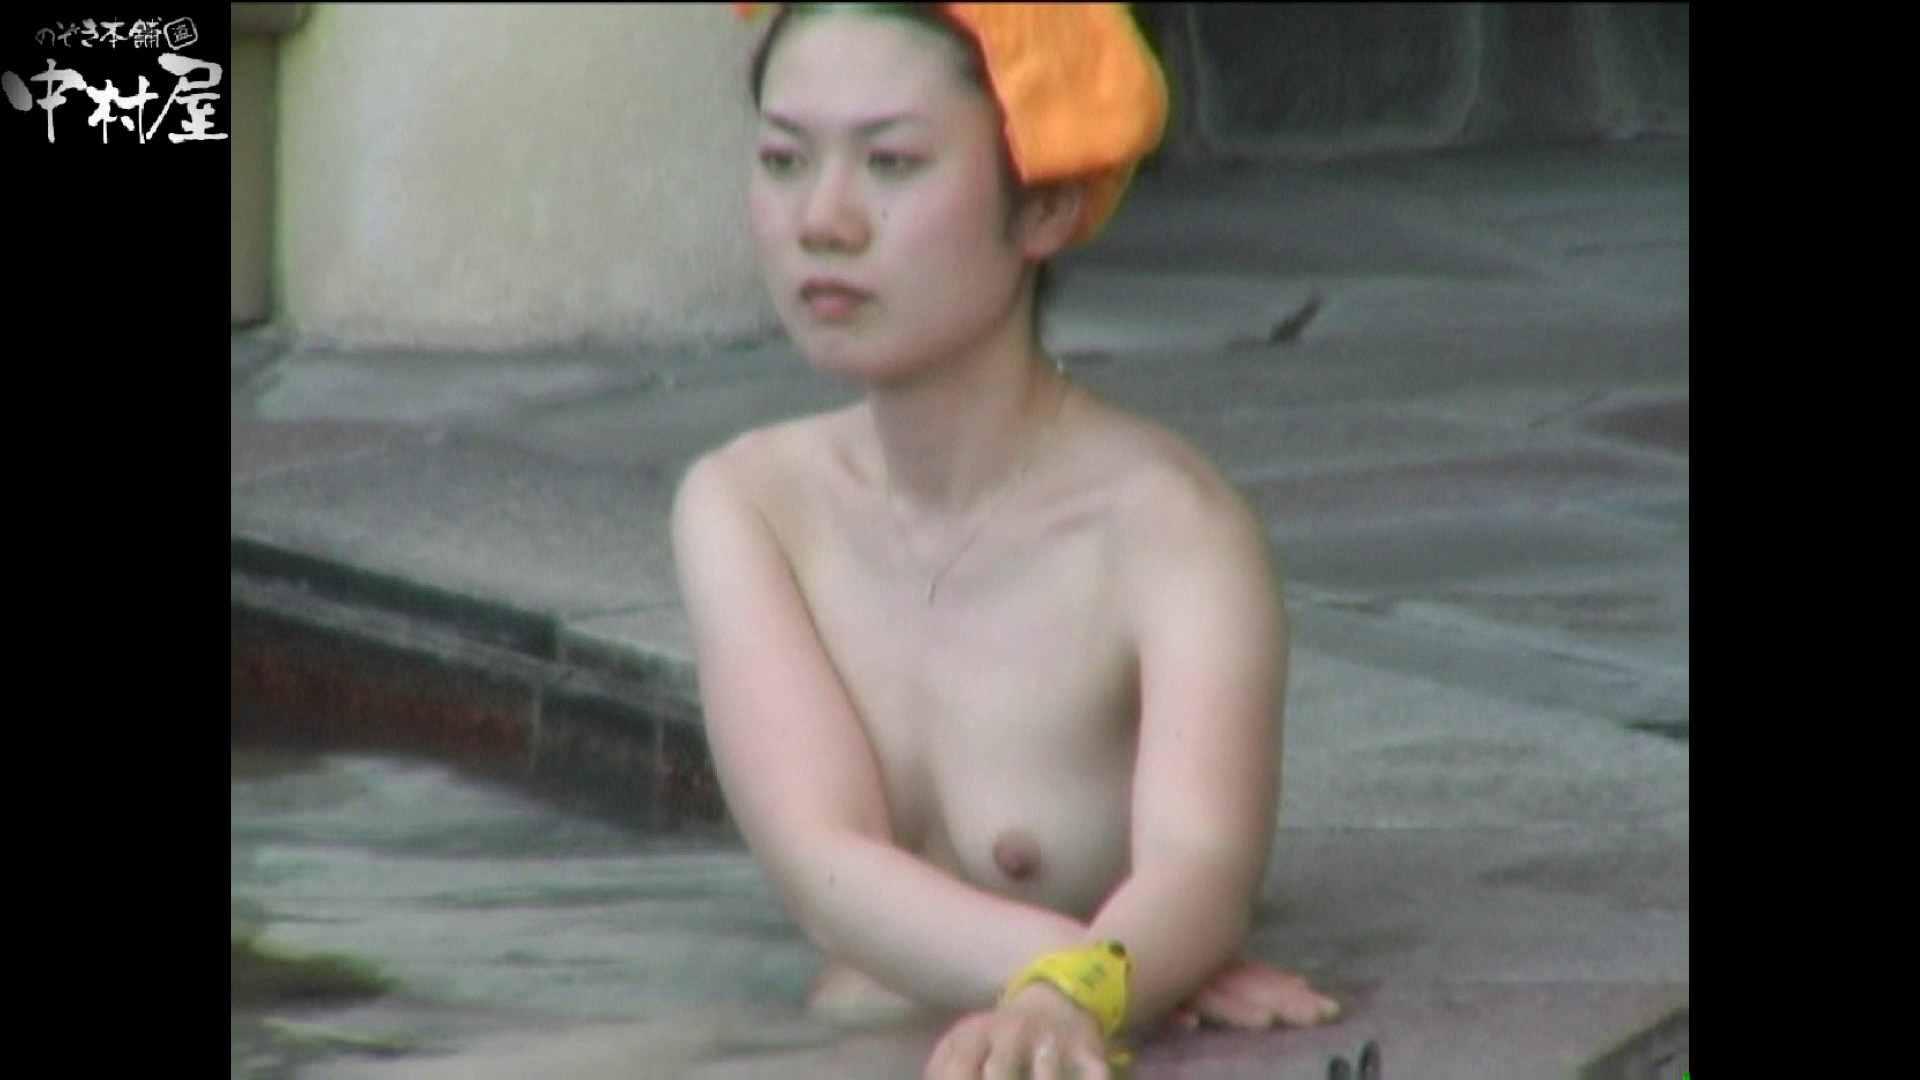 Aquaな露天風呂Vol.978 OL女体  88連発 87